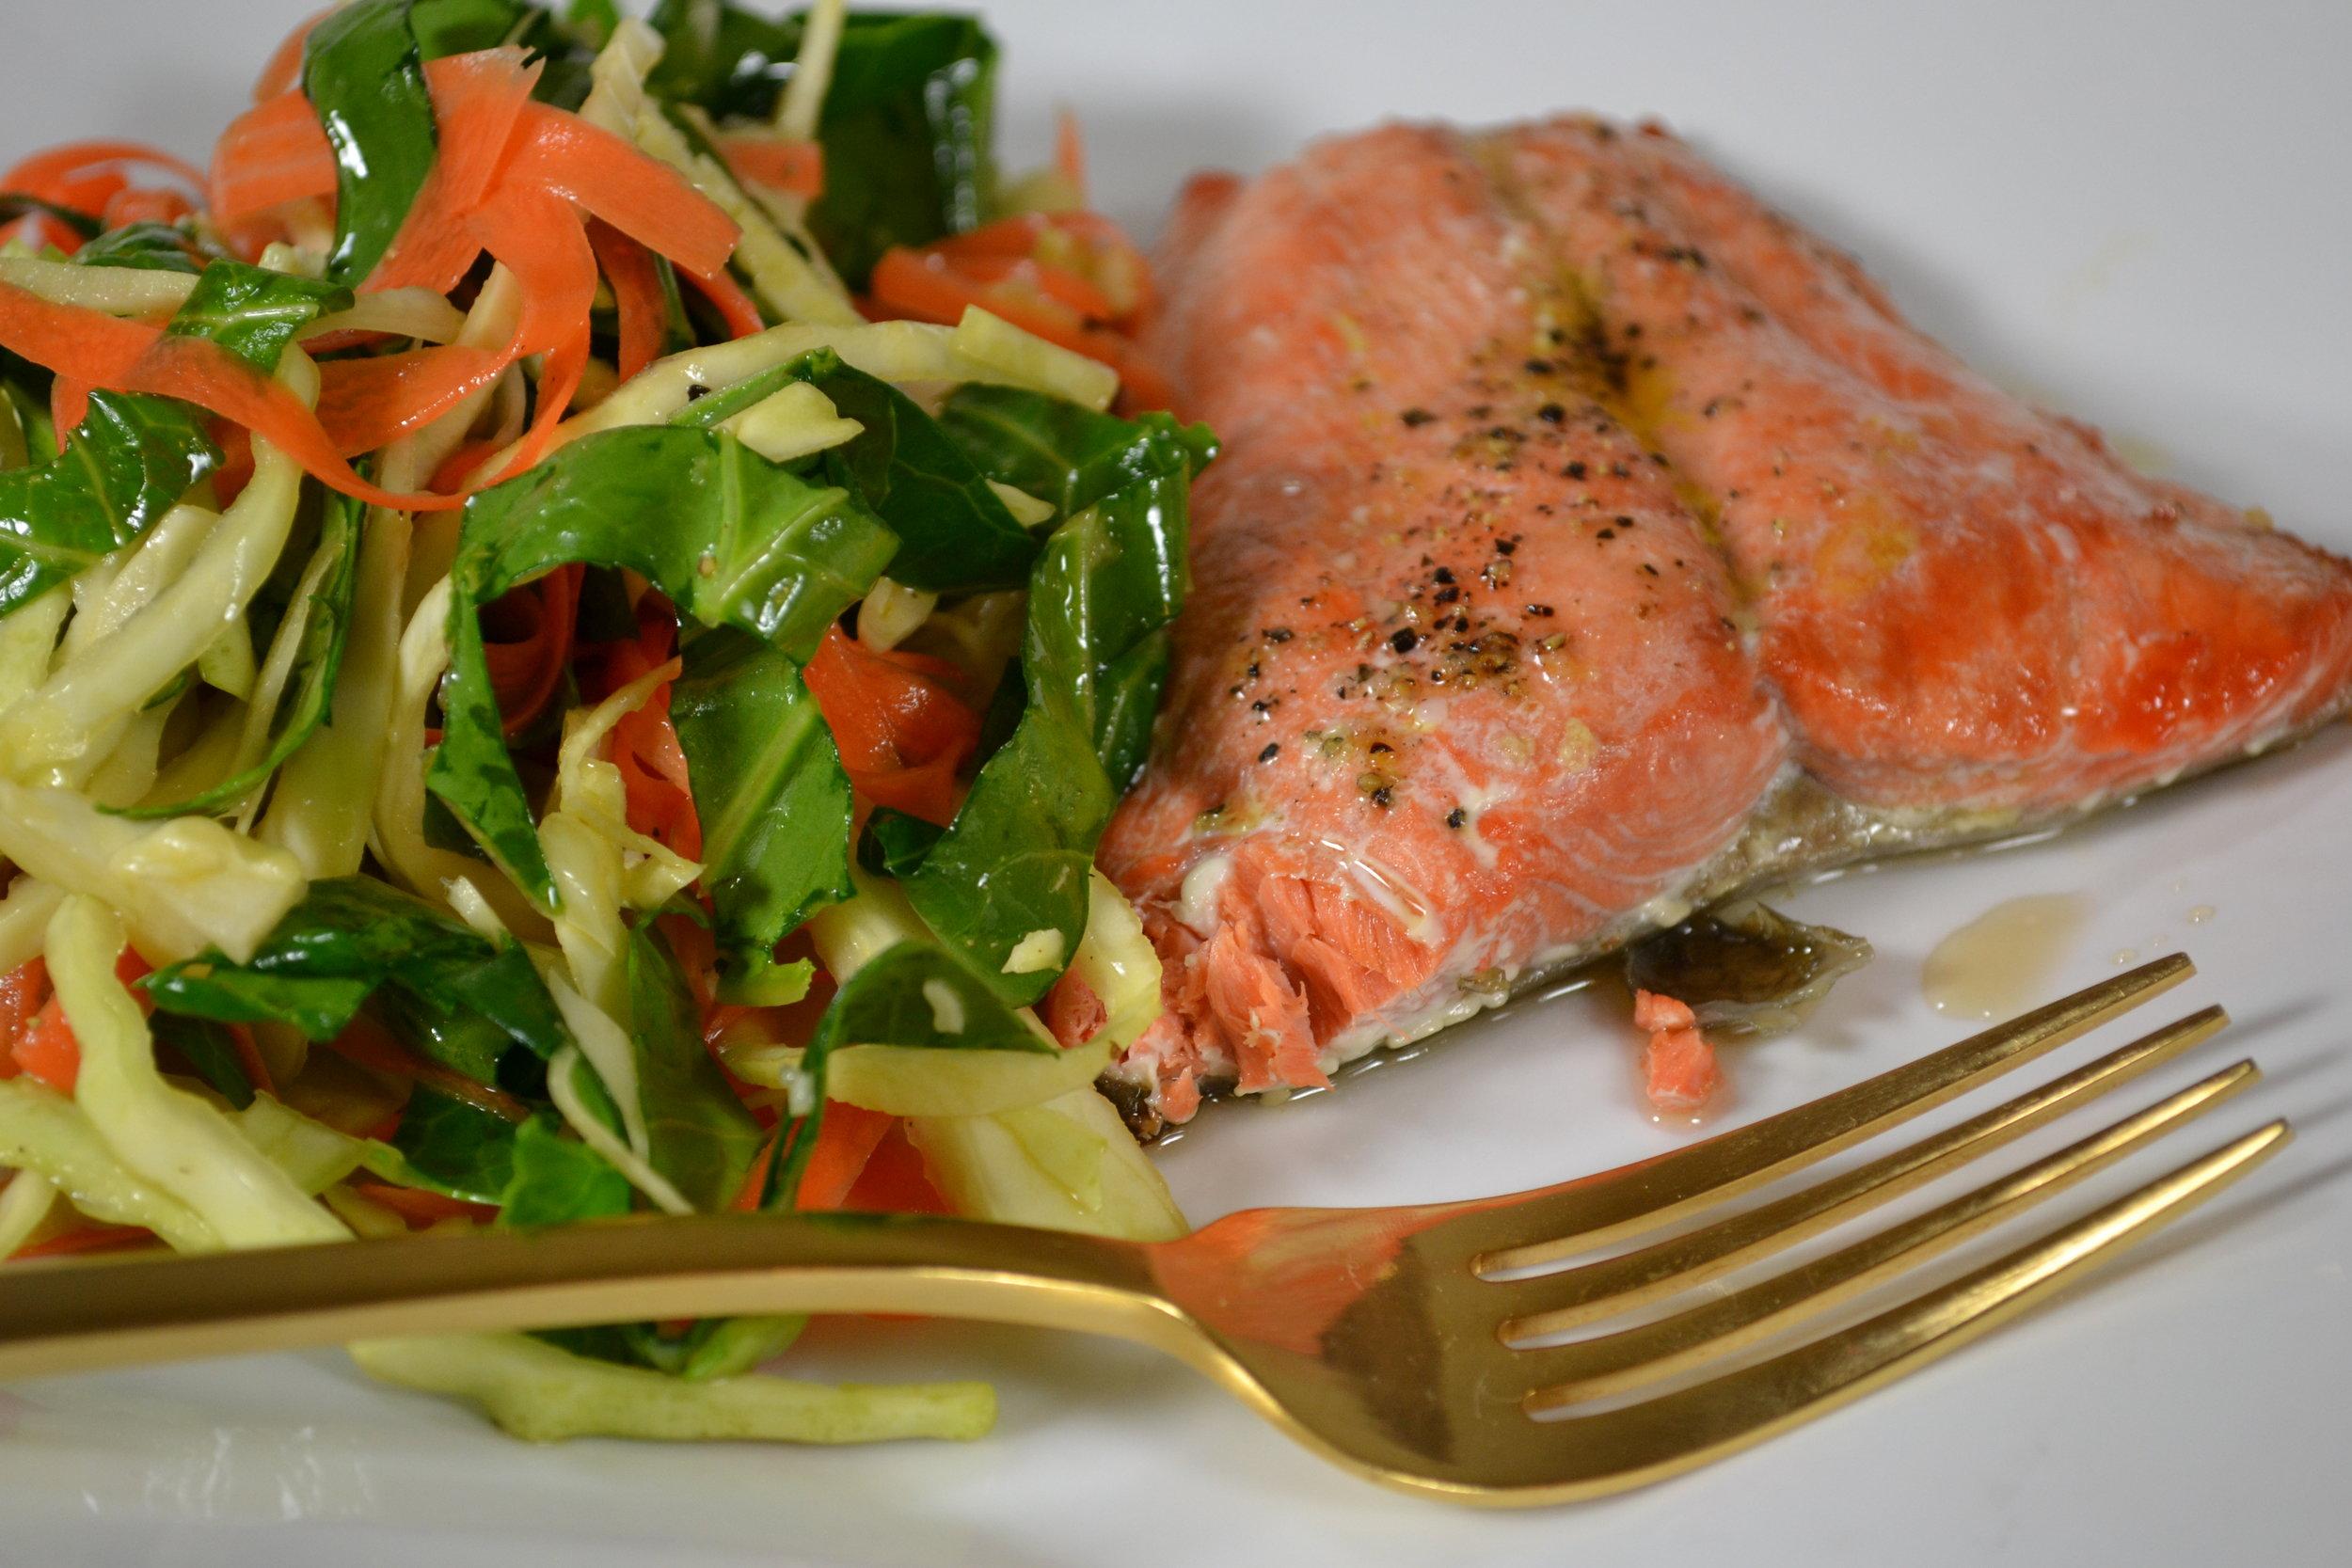 simple salmon and shredded salad